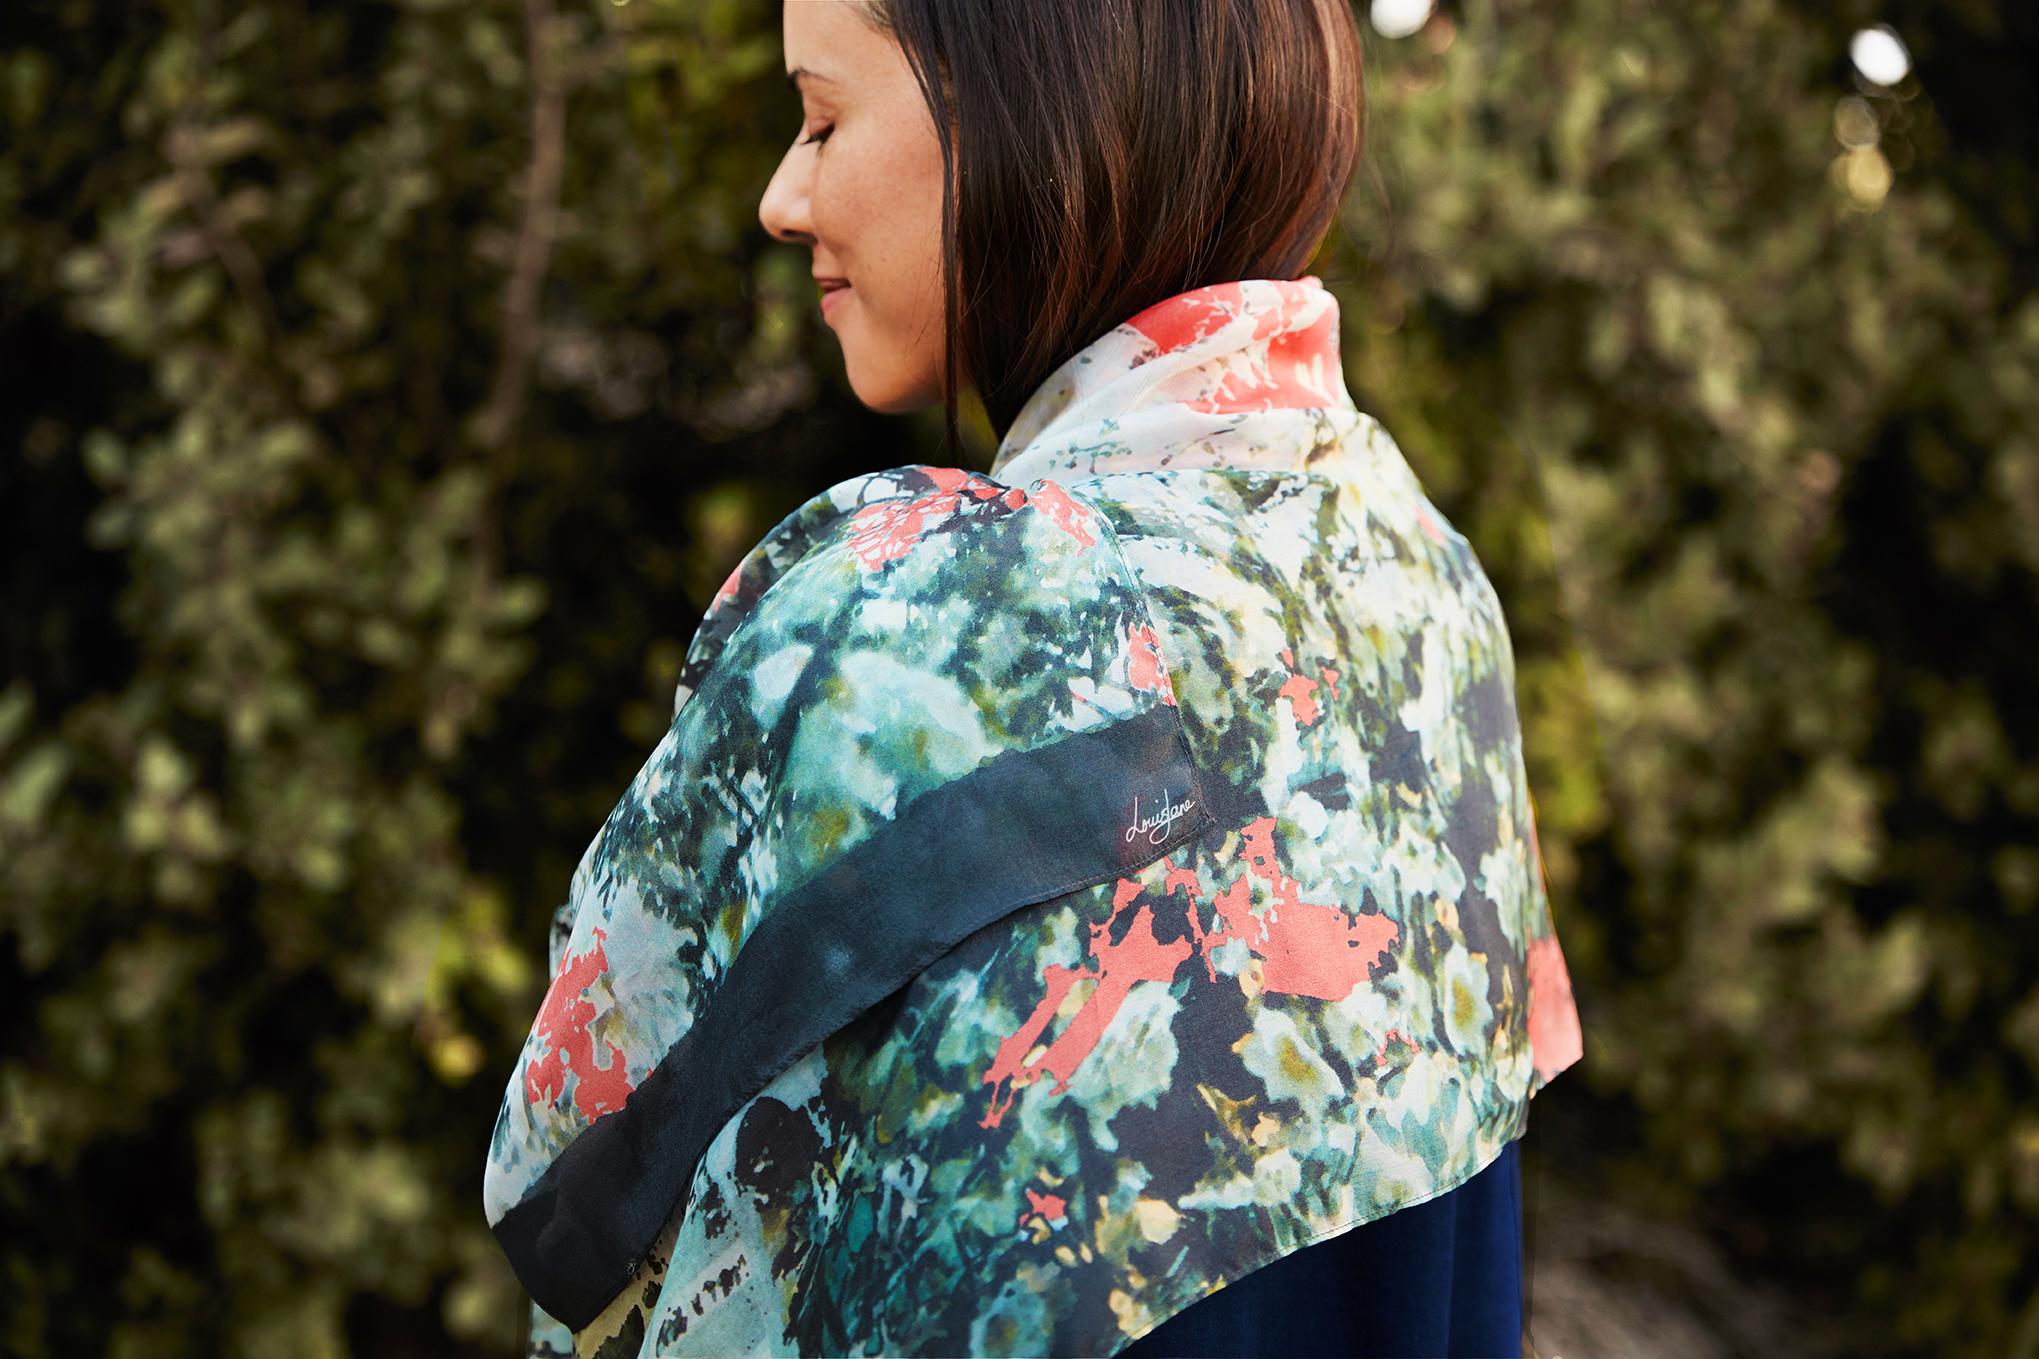 LouisJane_April_2018_urbanscapes shawl peach_V3.jpg